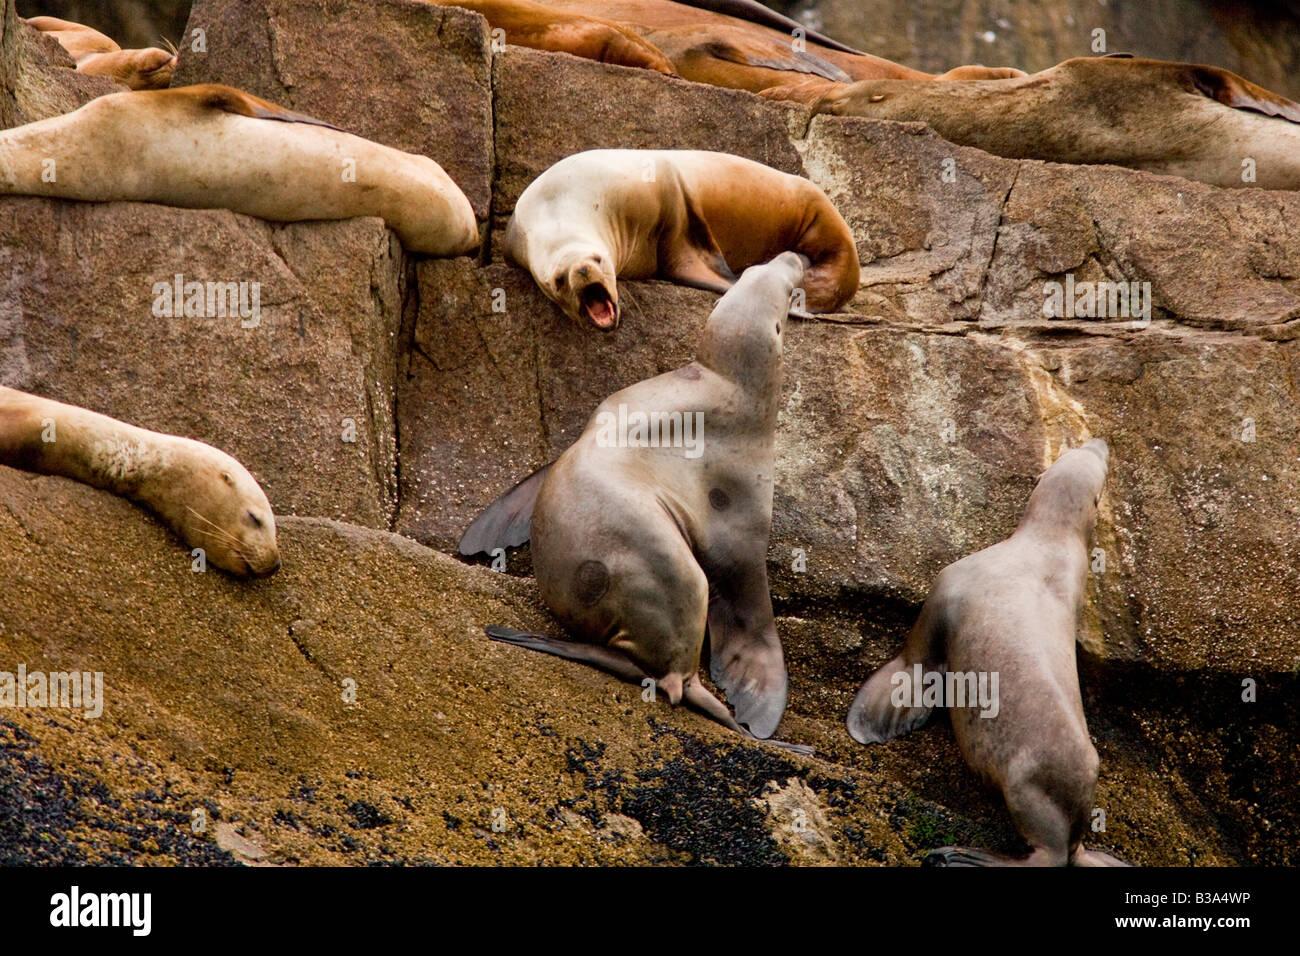 Stellar Sea Lions (Eumetopias jubatus) vie for postion on rocks in Kenai Fjords NP - Stock Image